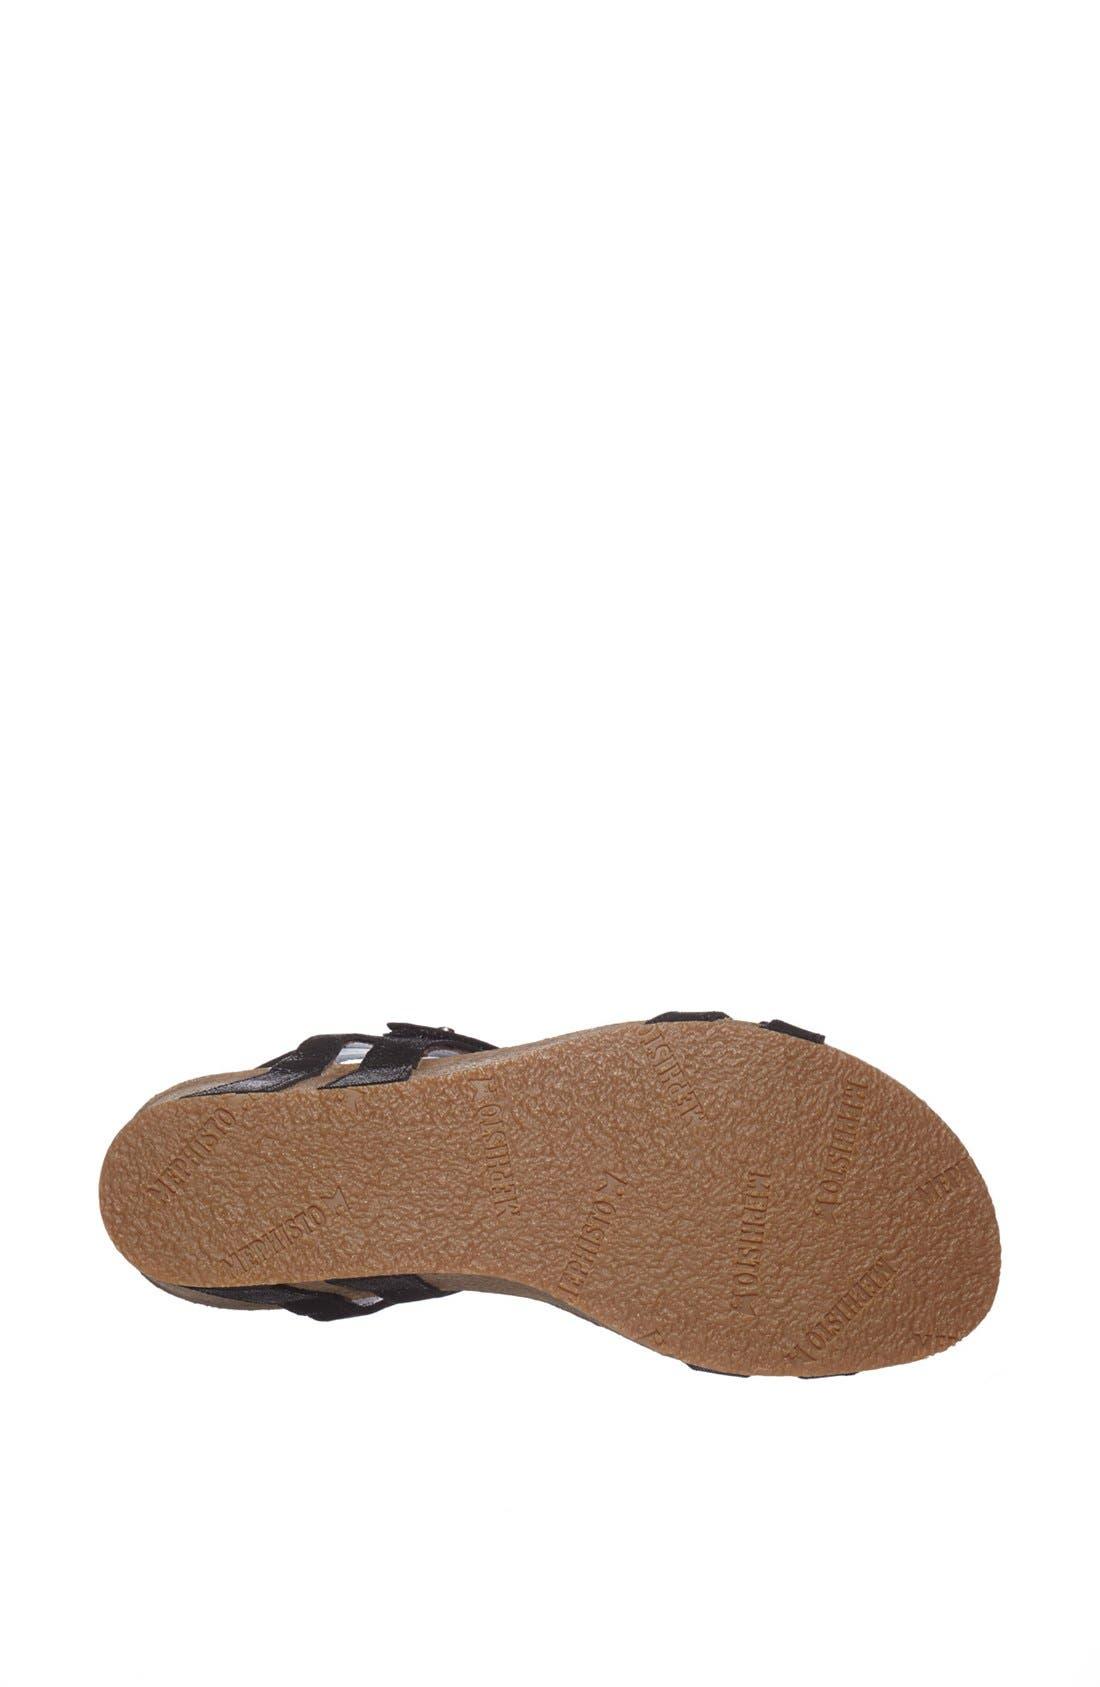 'Minoa' Wedge Sandal,                             Alternate thumbnail 3, color,                             BLACK